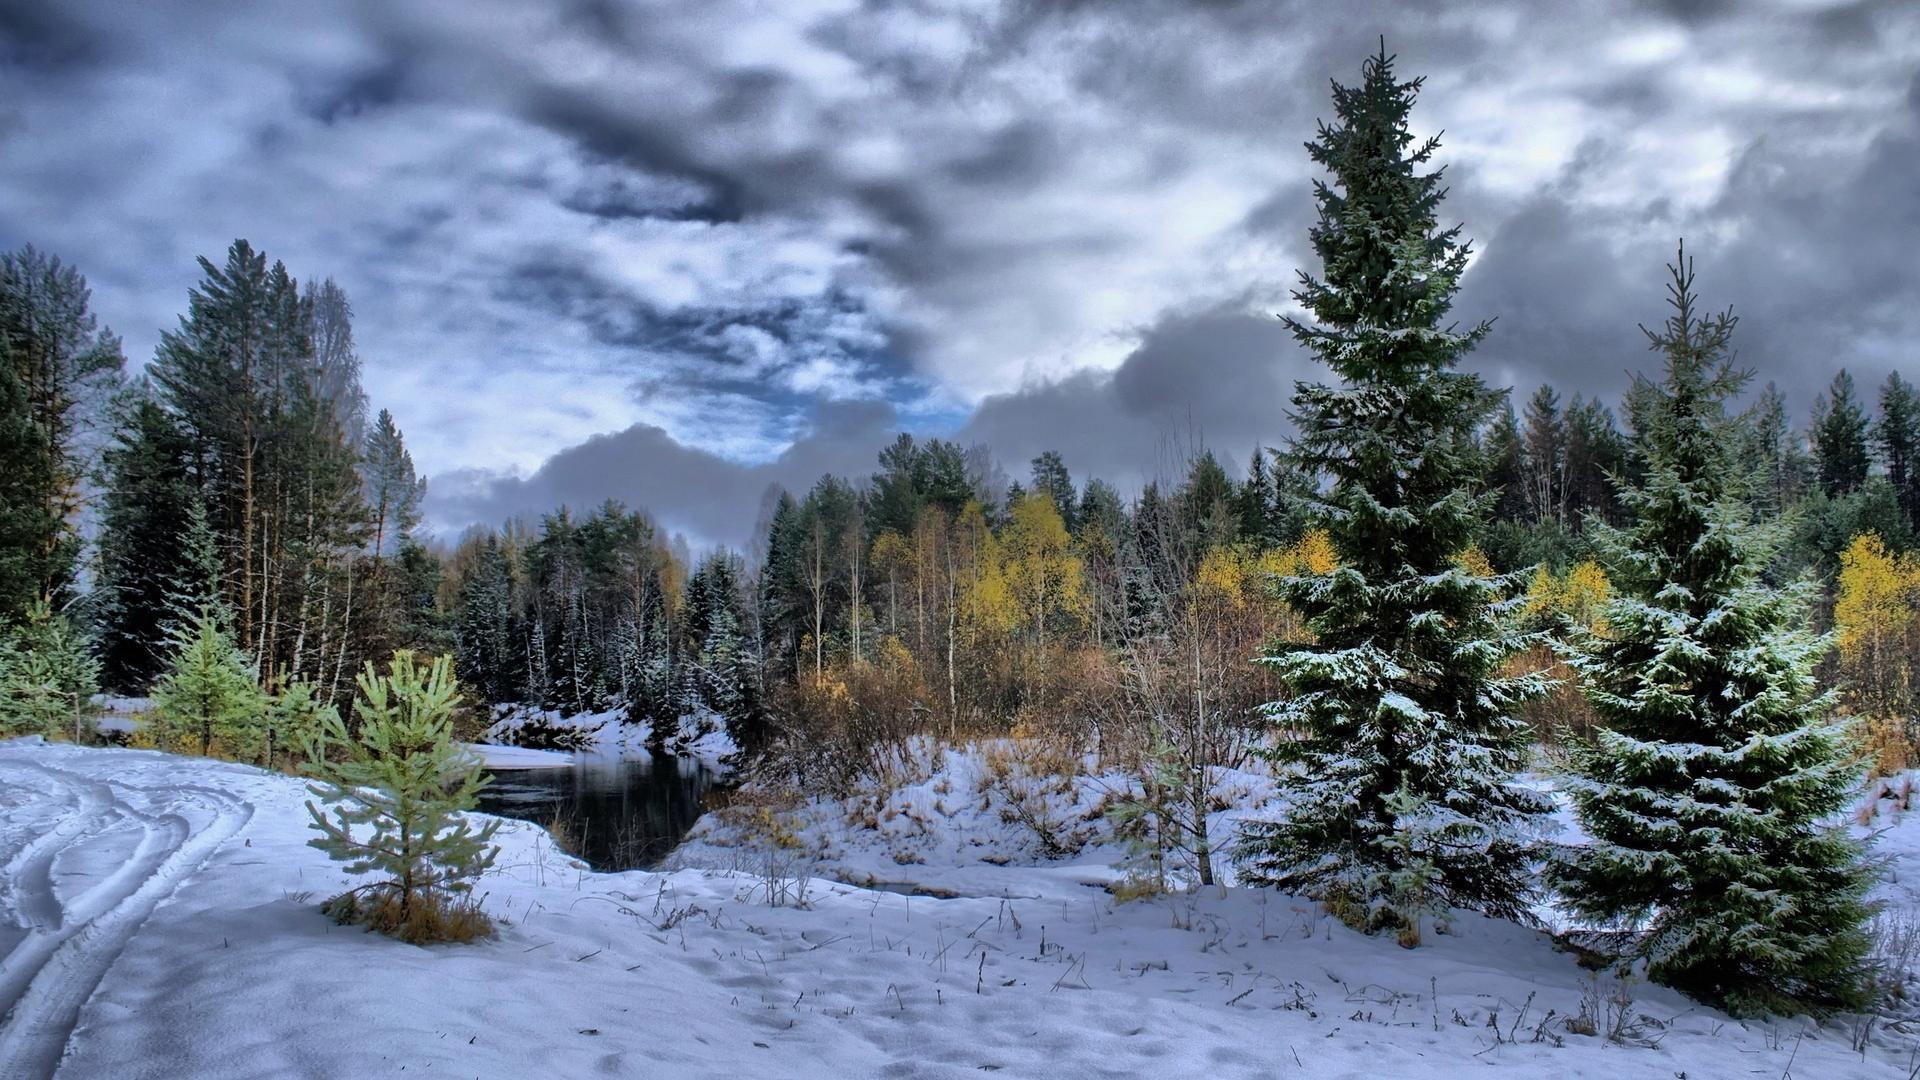 winter scene photos | Download Superb Winter Scene wallpaper 300478